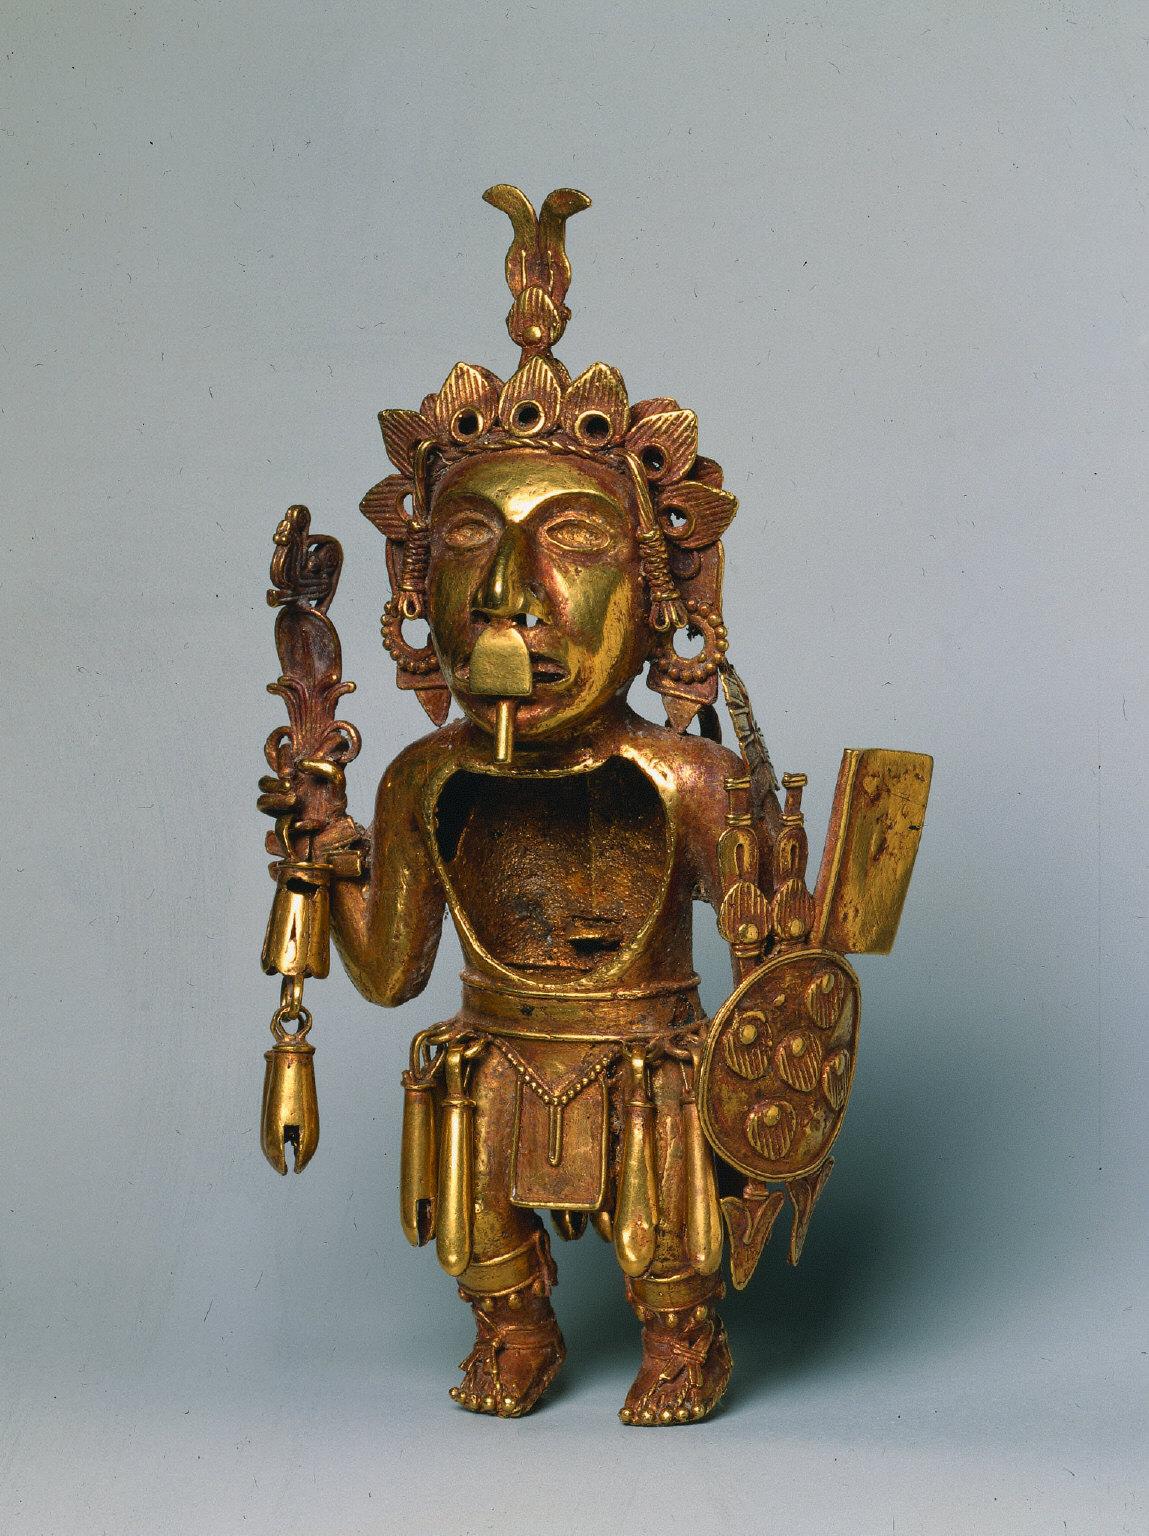 Warrior Figurine